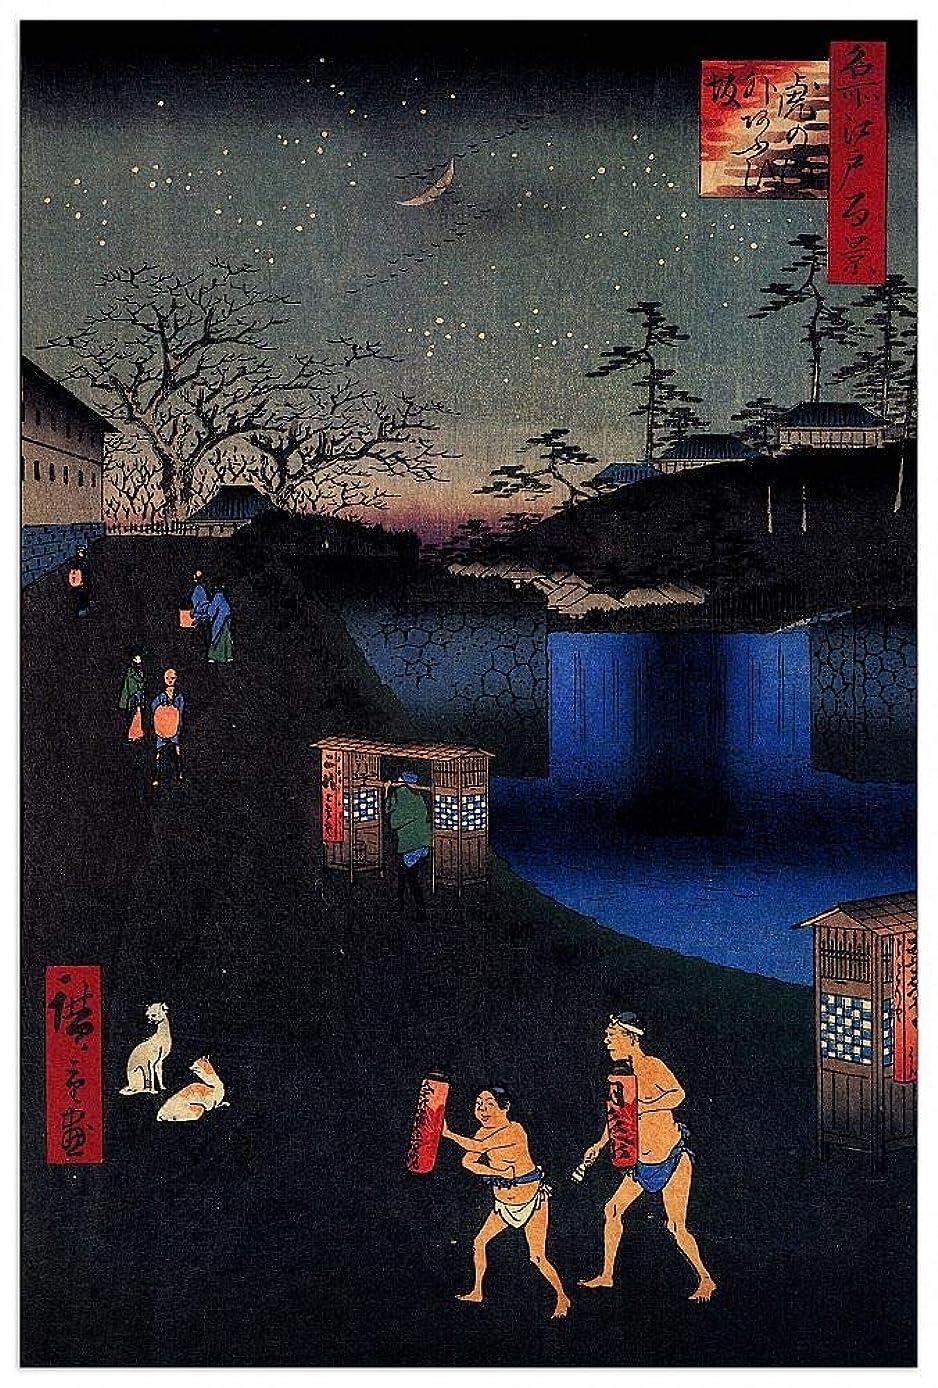 ArtPlaza TW93000 Hiroshige Utagawa - Outside Toranomon Gate Decorative Panel 27.5x39.5 Inch Multicolored